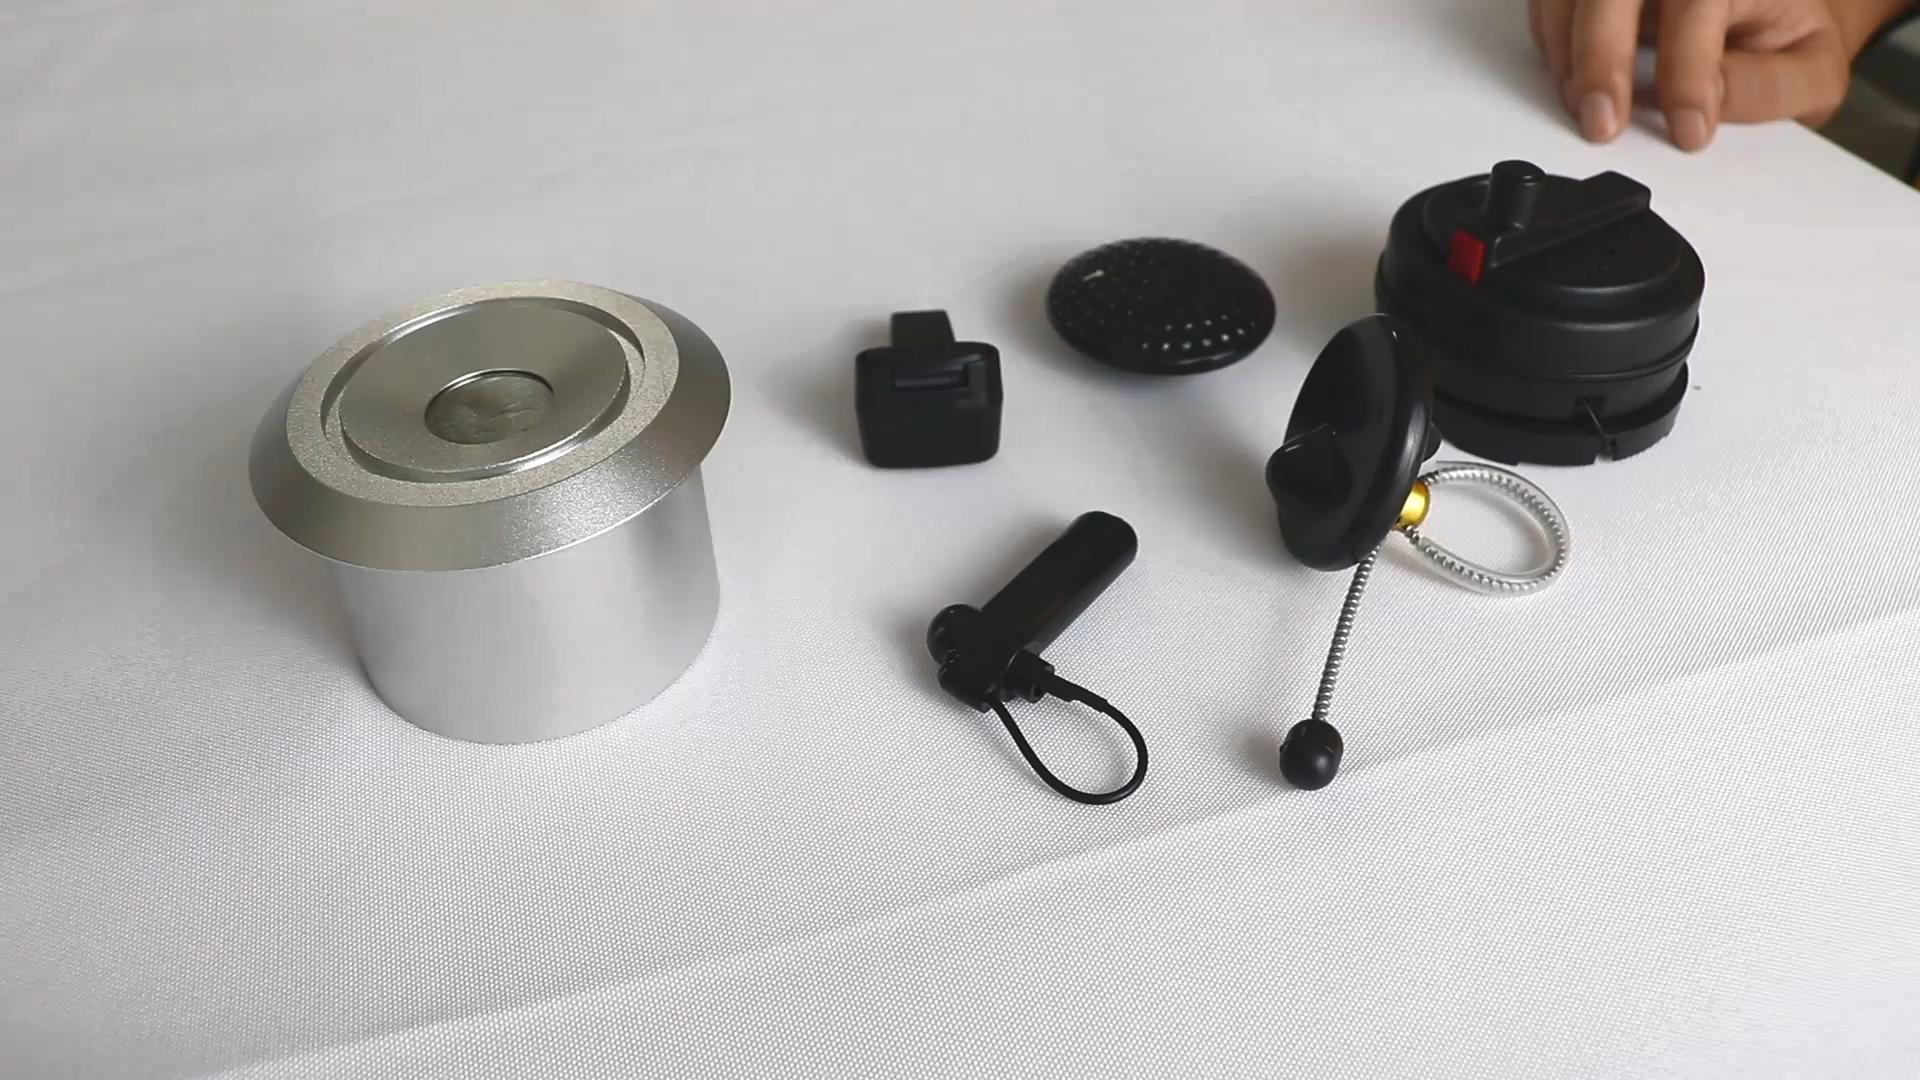 high quality 16000 GS magnet EAS detacher security tag remover